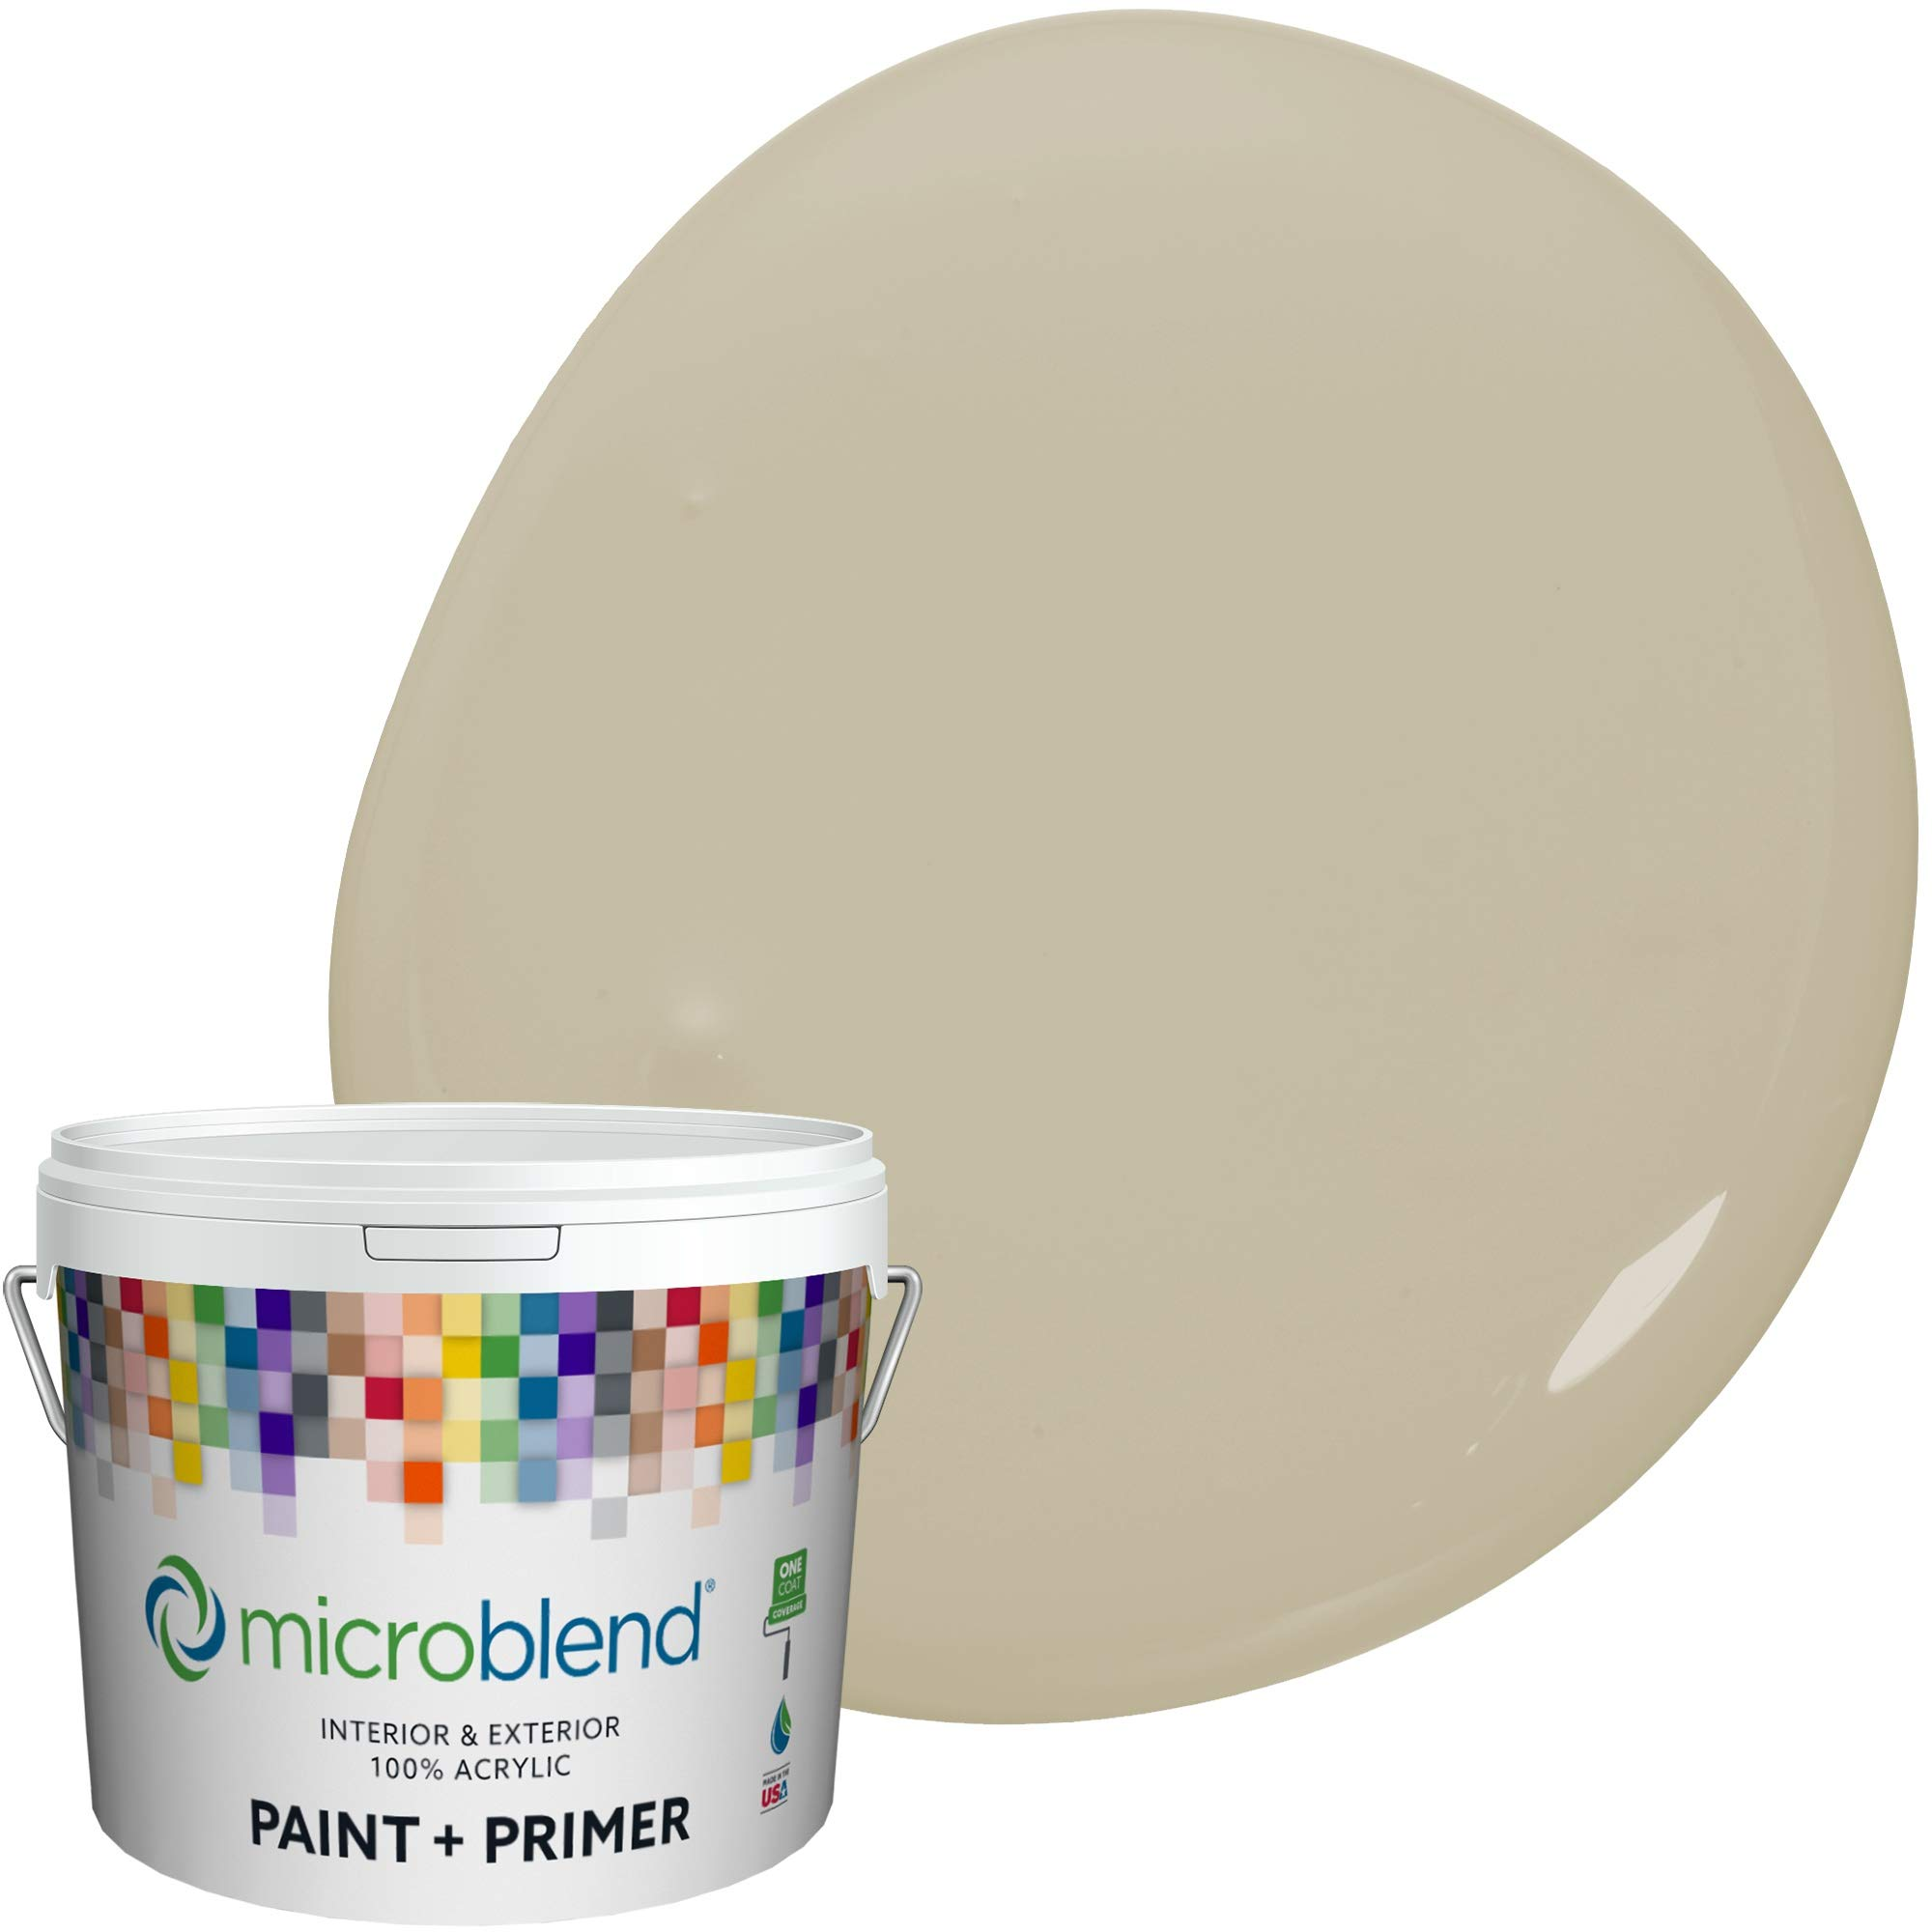 Microblend Interior Paint + Primer, Antique Sage, Semi-Gloss Sheen, 1 Gallon, Custom Made, Premium Quality One Coat Hide & Washable Paint (73241-2-M1633B3)